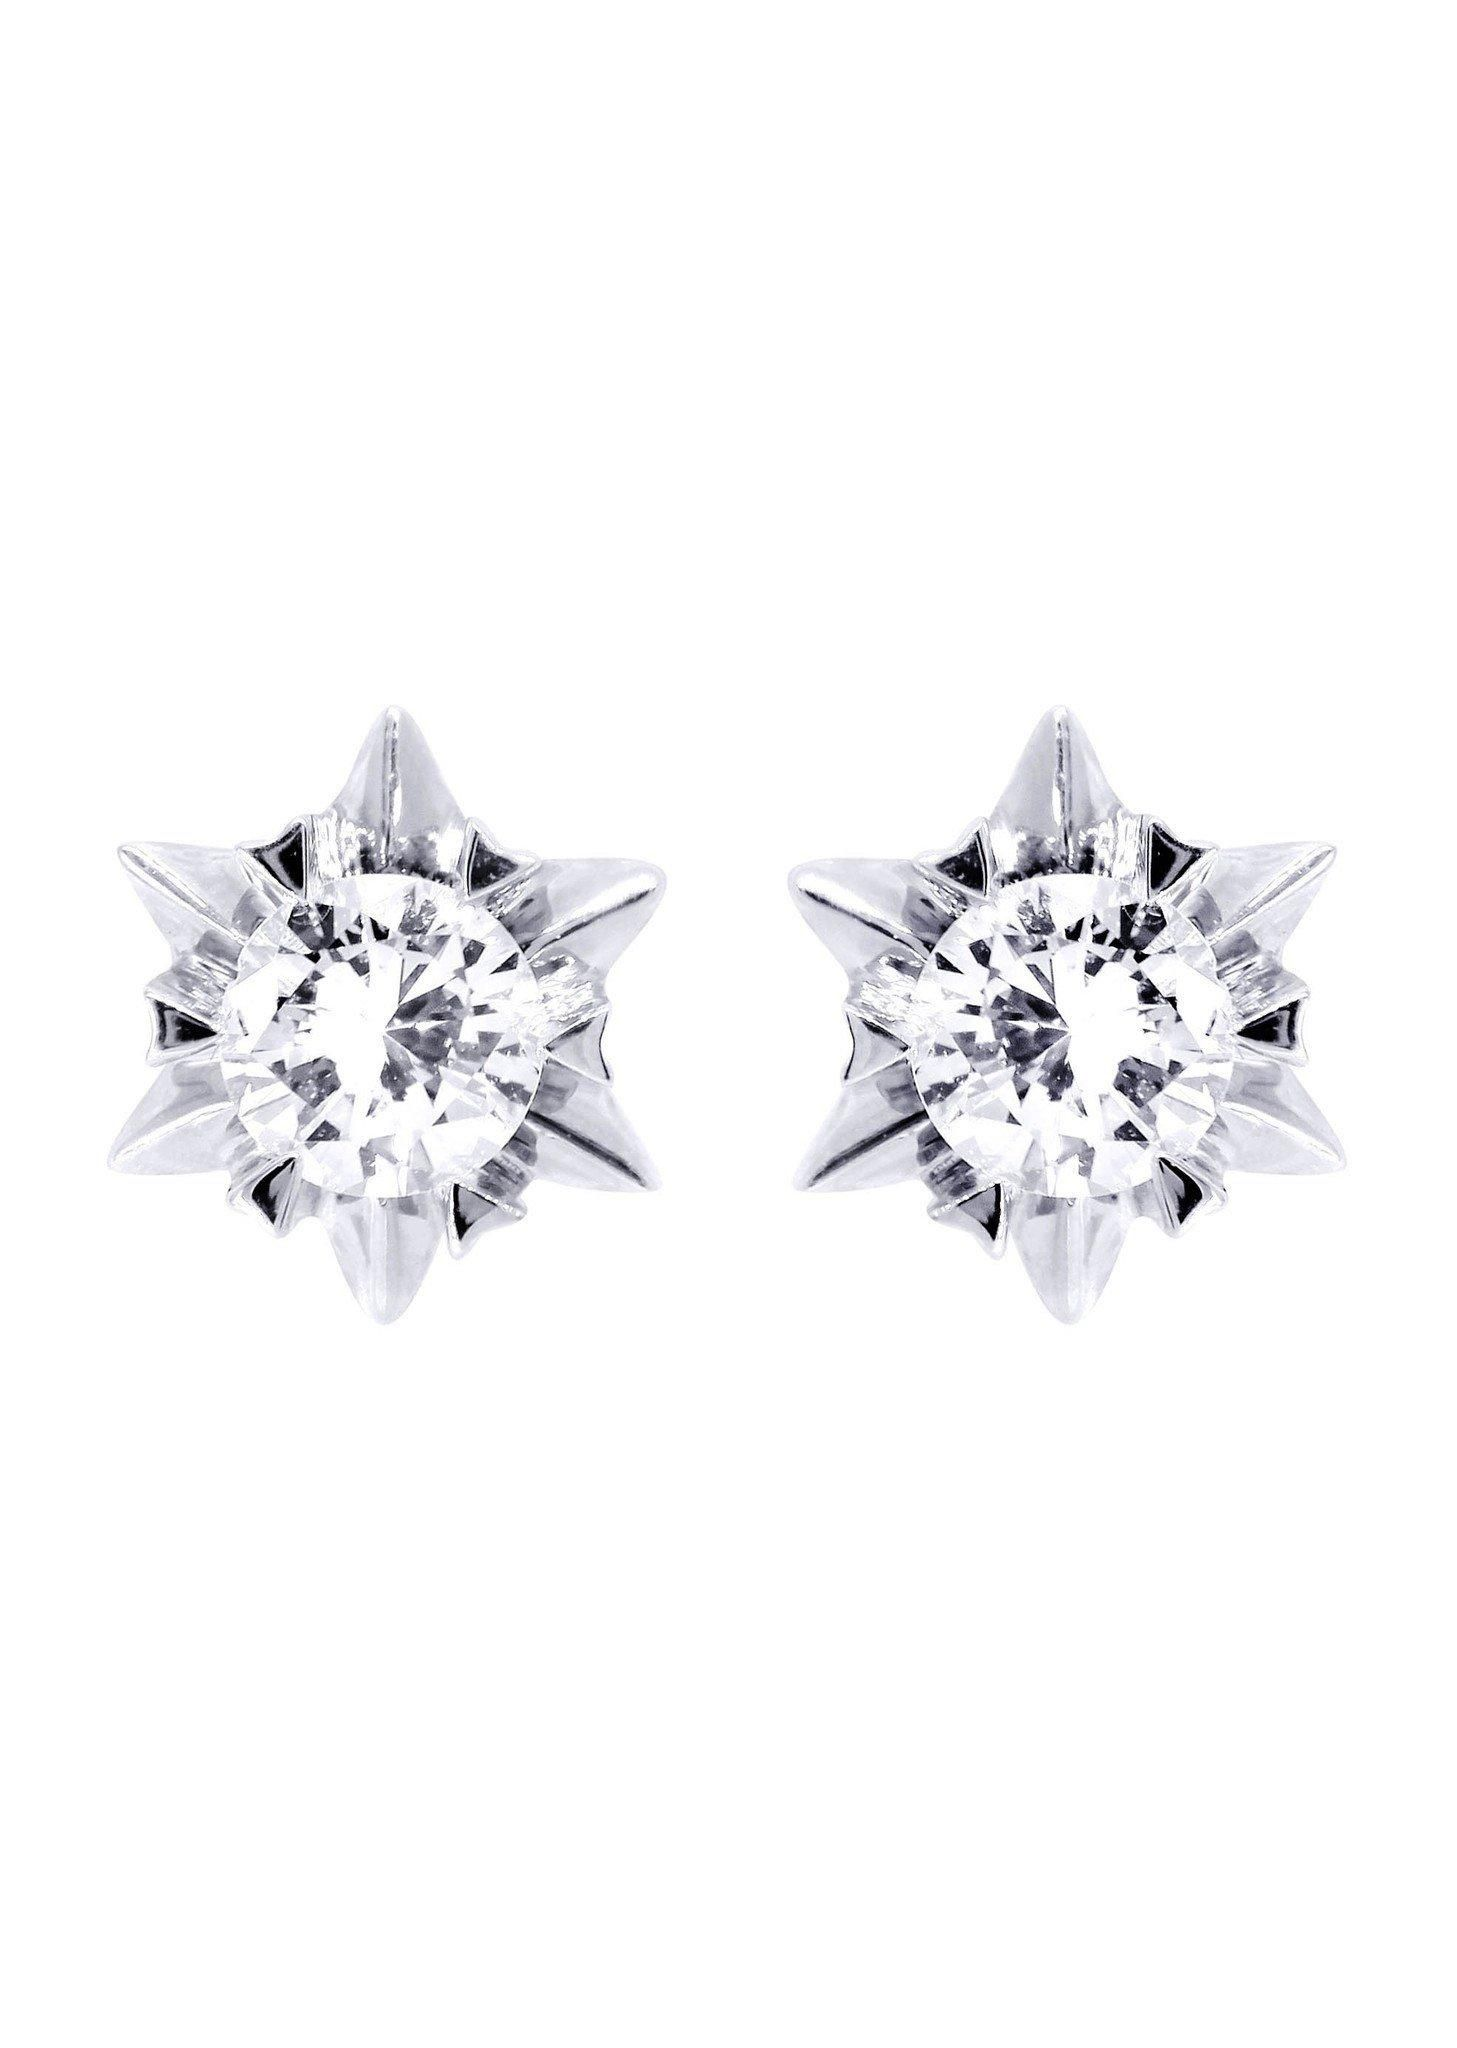 Frostnyc frost nyc stud diamond earrings for men k white gold